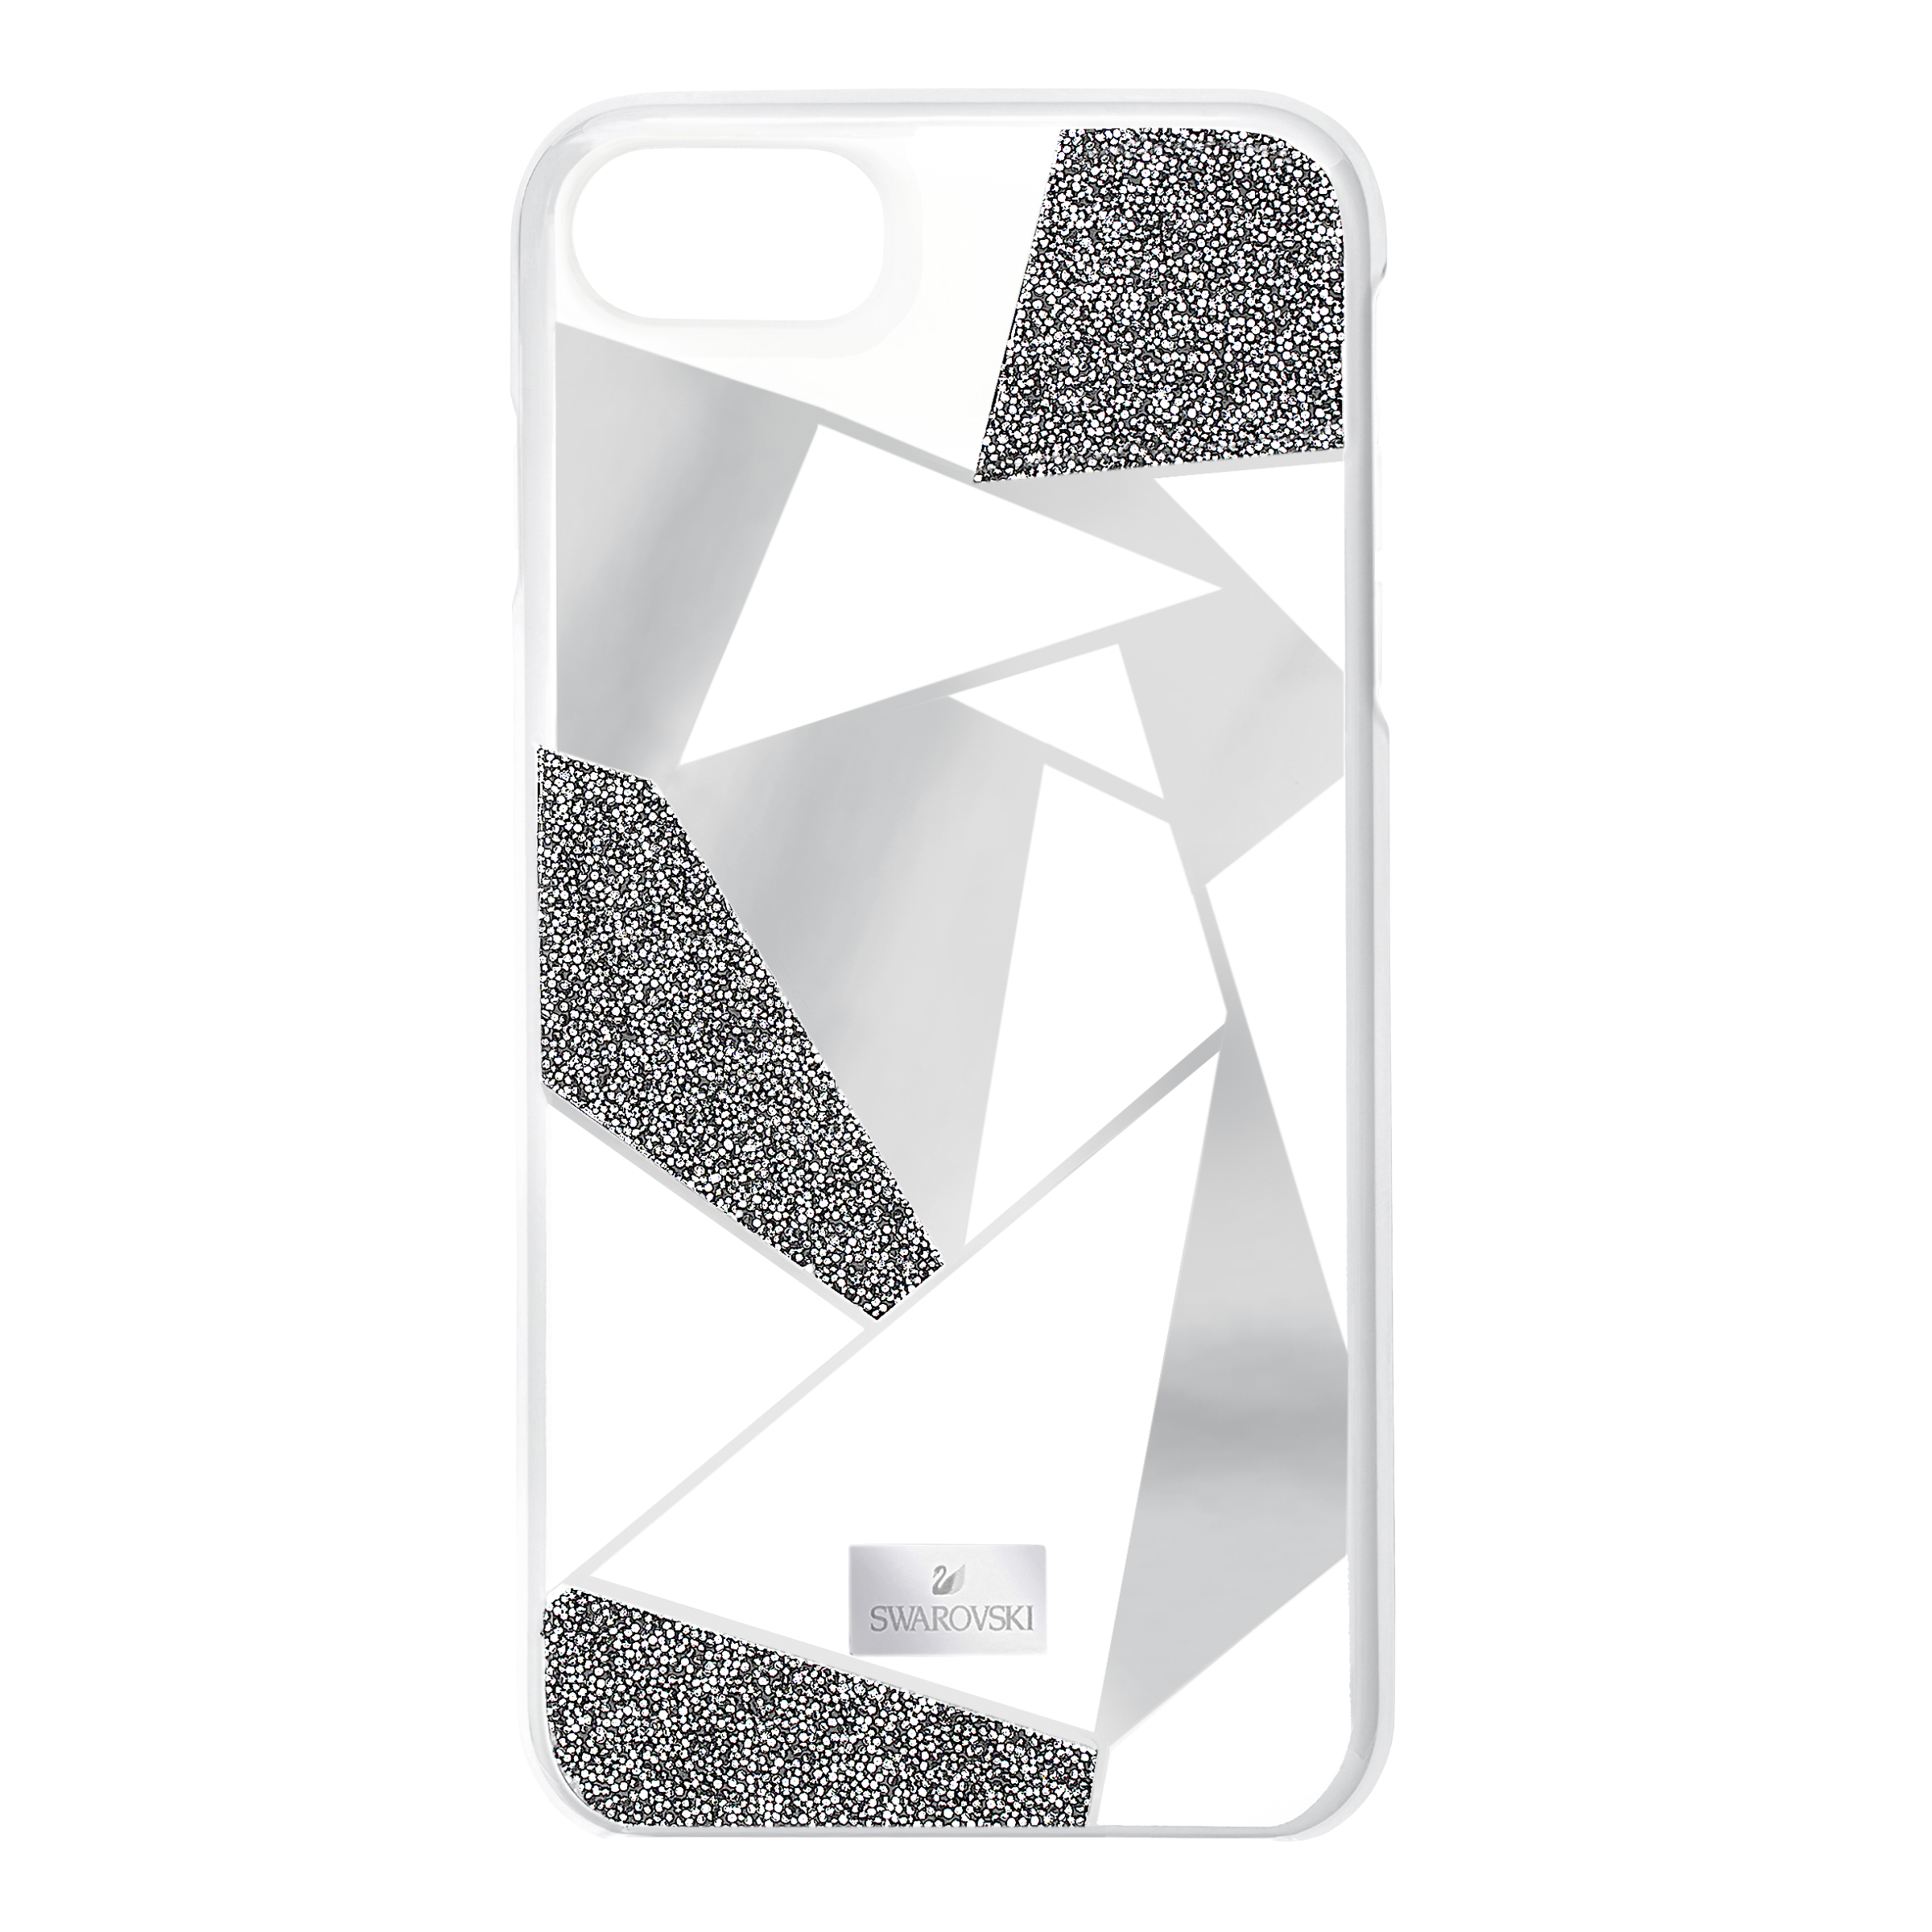 Heroism Smartphone Case With Bumper, Iphone® 8, Gray